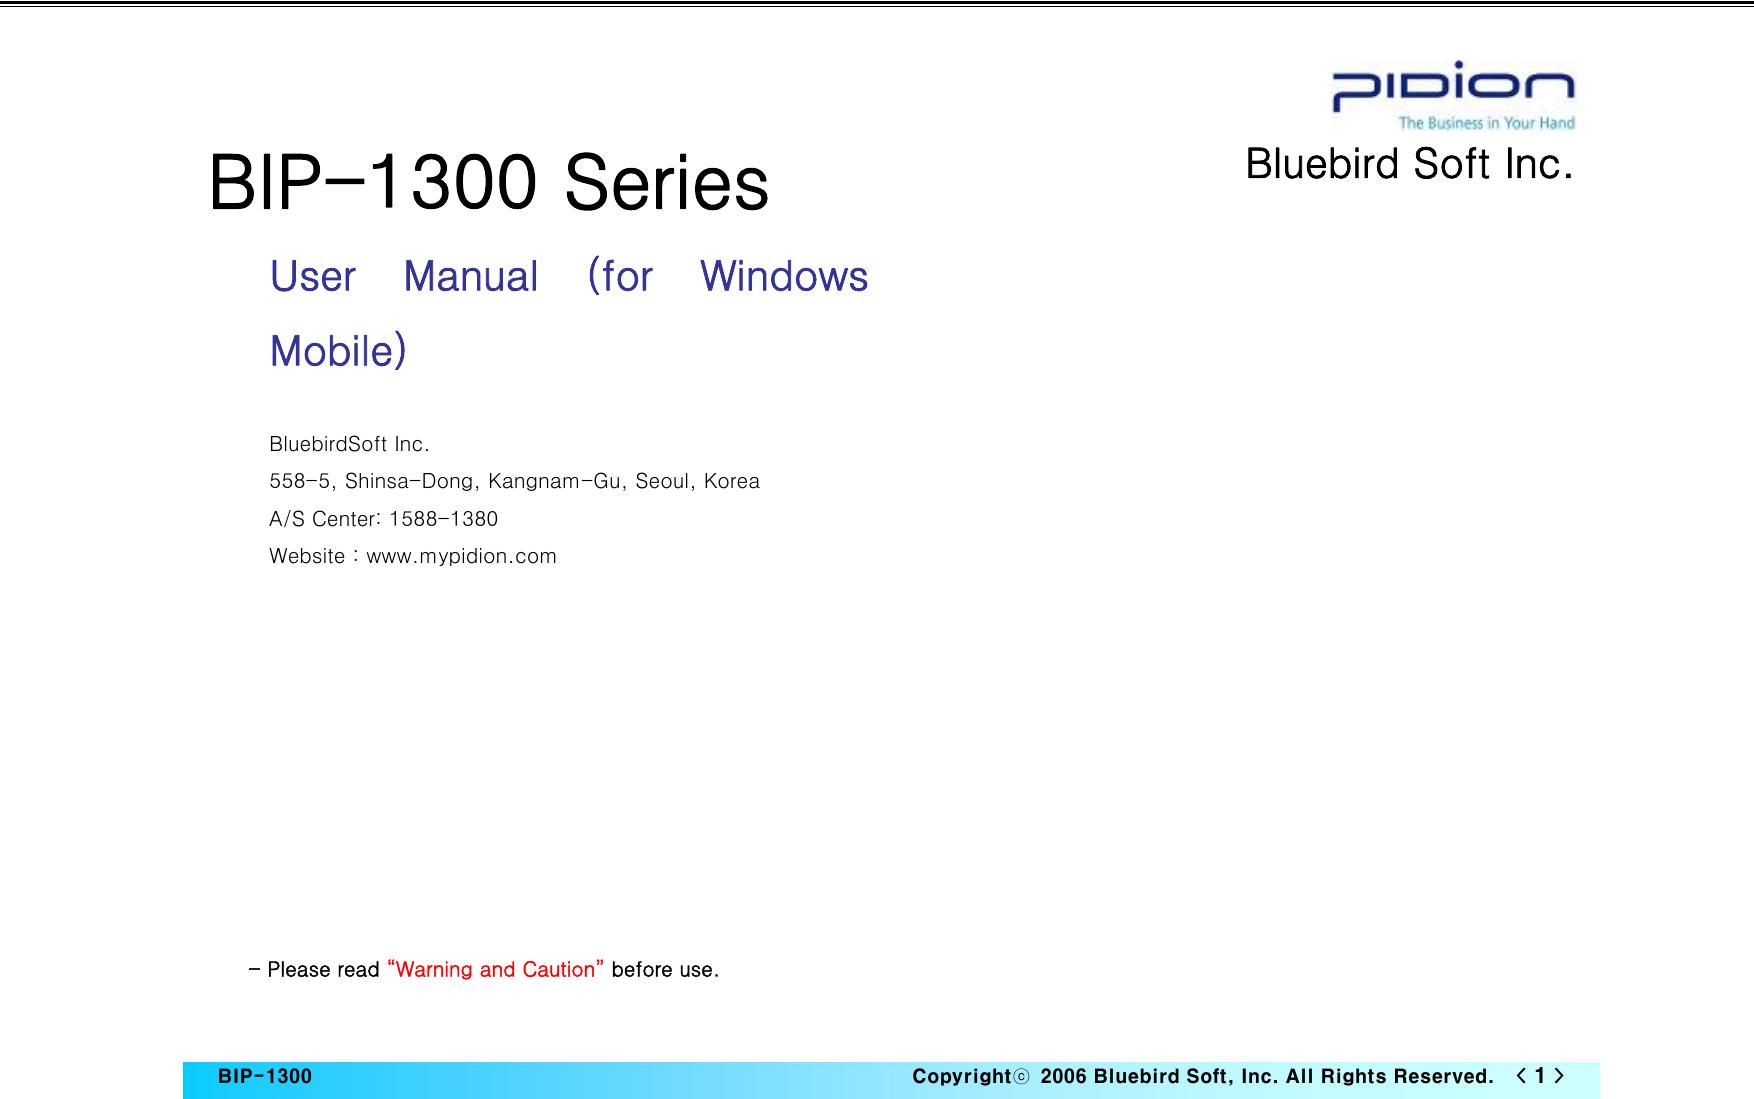 bluebird bip13x0 industrial pda user manual bip 1300 user s guide f rh usermanual wiki Example User Guide Kindle Fire User Guide